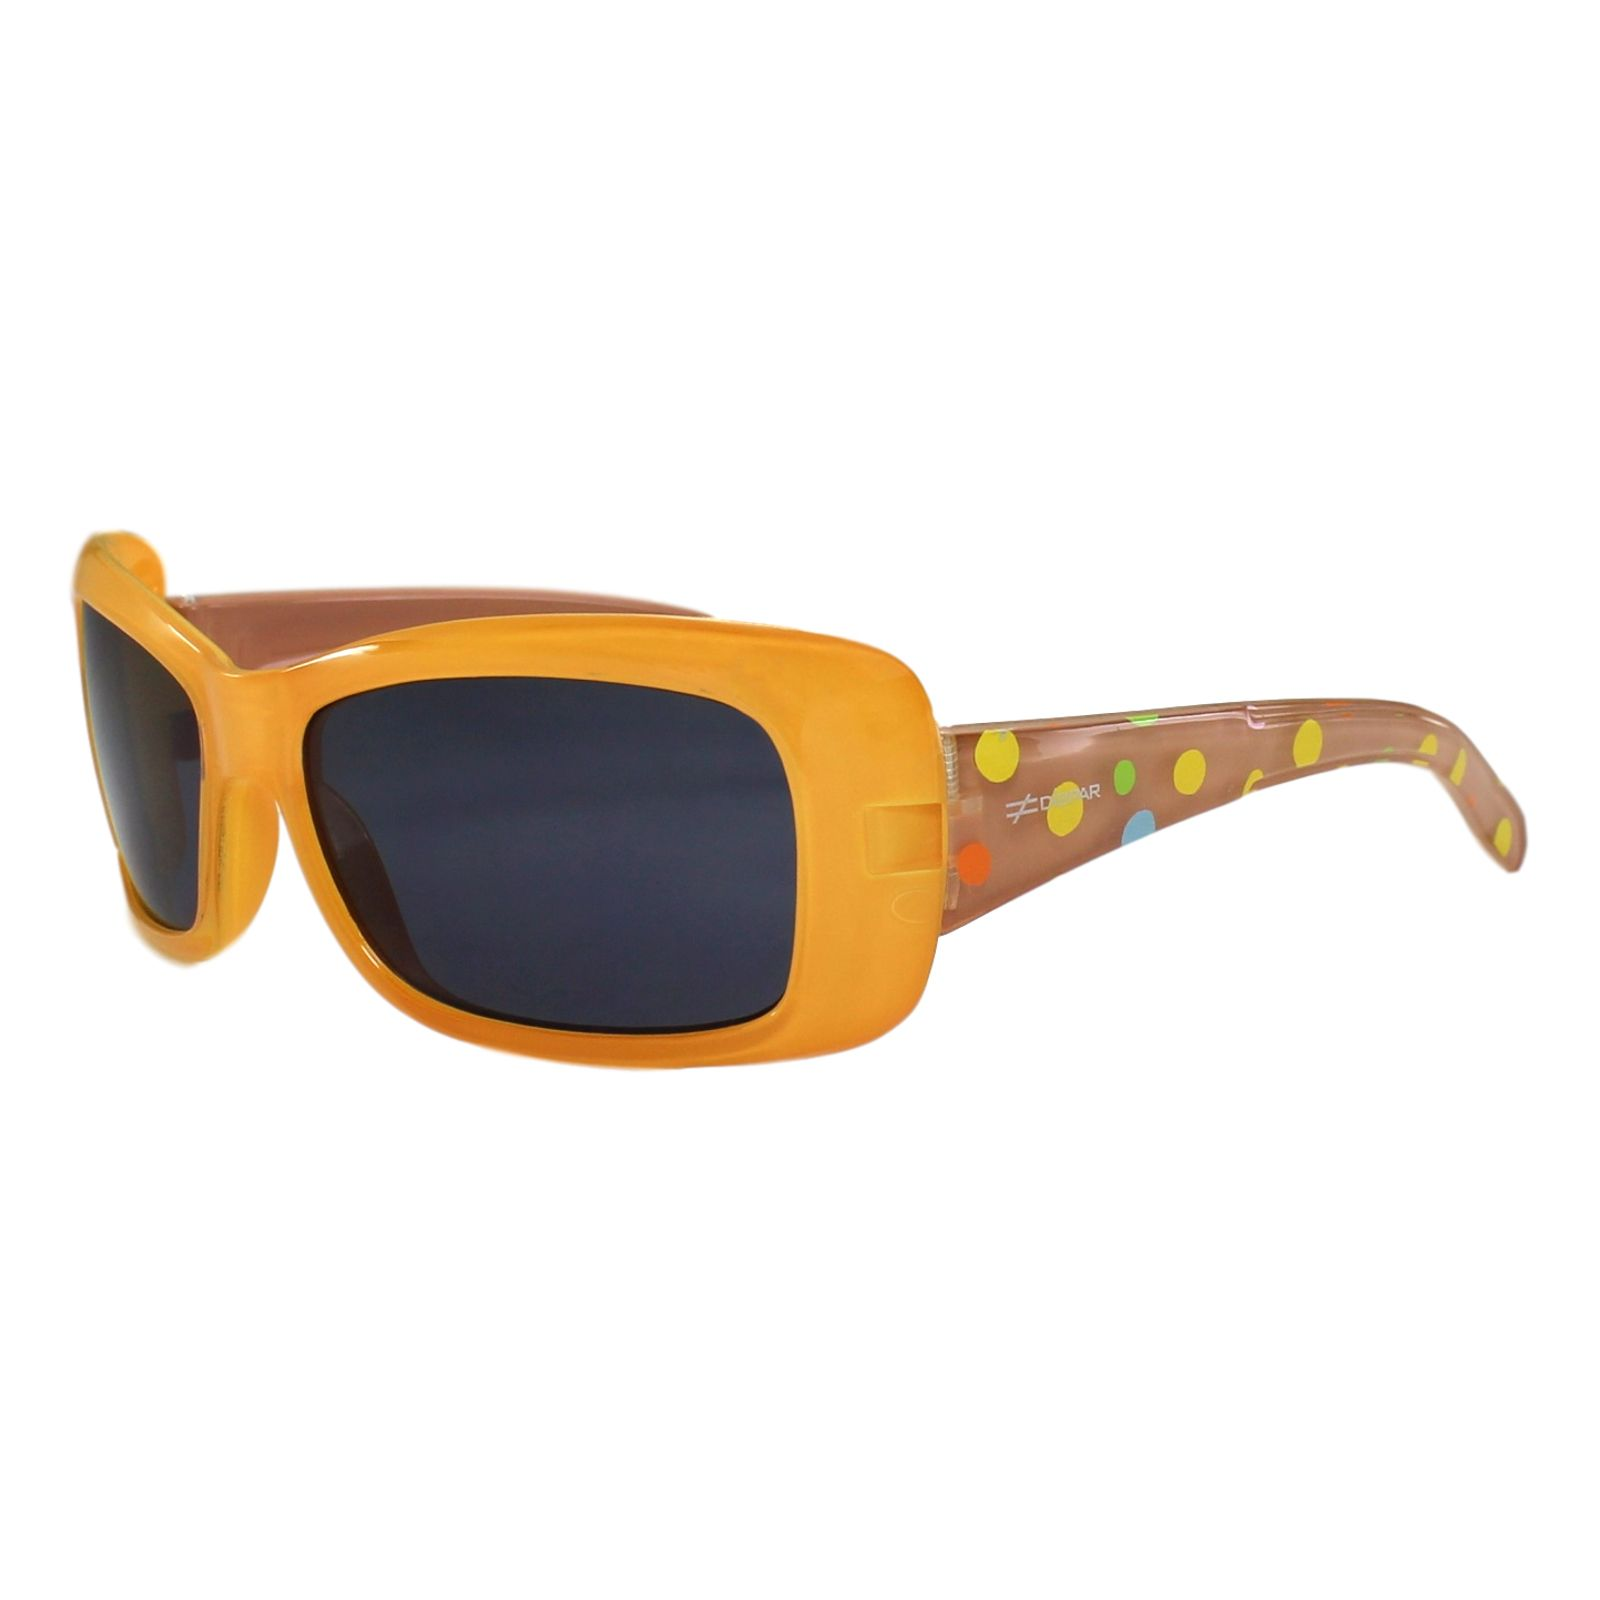 Óculos de Sol Díspar ID1734 Poá Infantil 6 a 9 anos - Proteção UV400 - Laranja